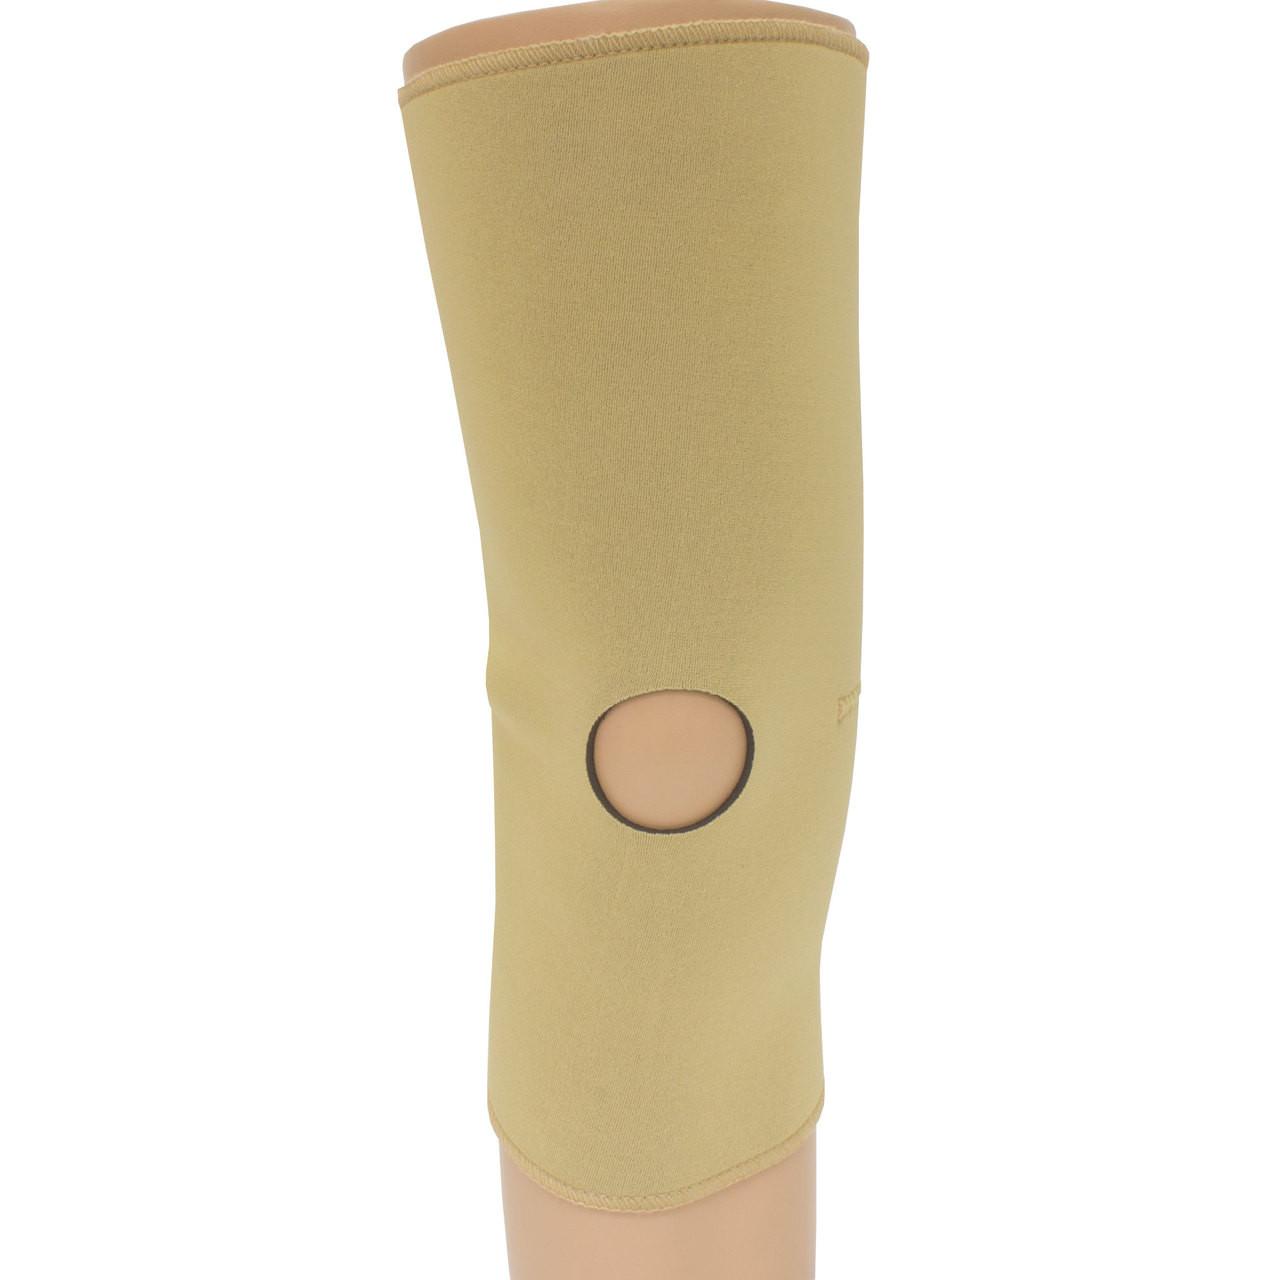 3fd6f03b07a Neoprene Knee Support Compression Anti-Migration Sleeve - Freeman ...